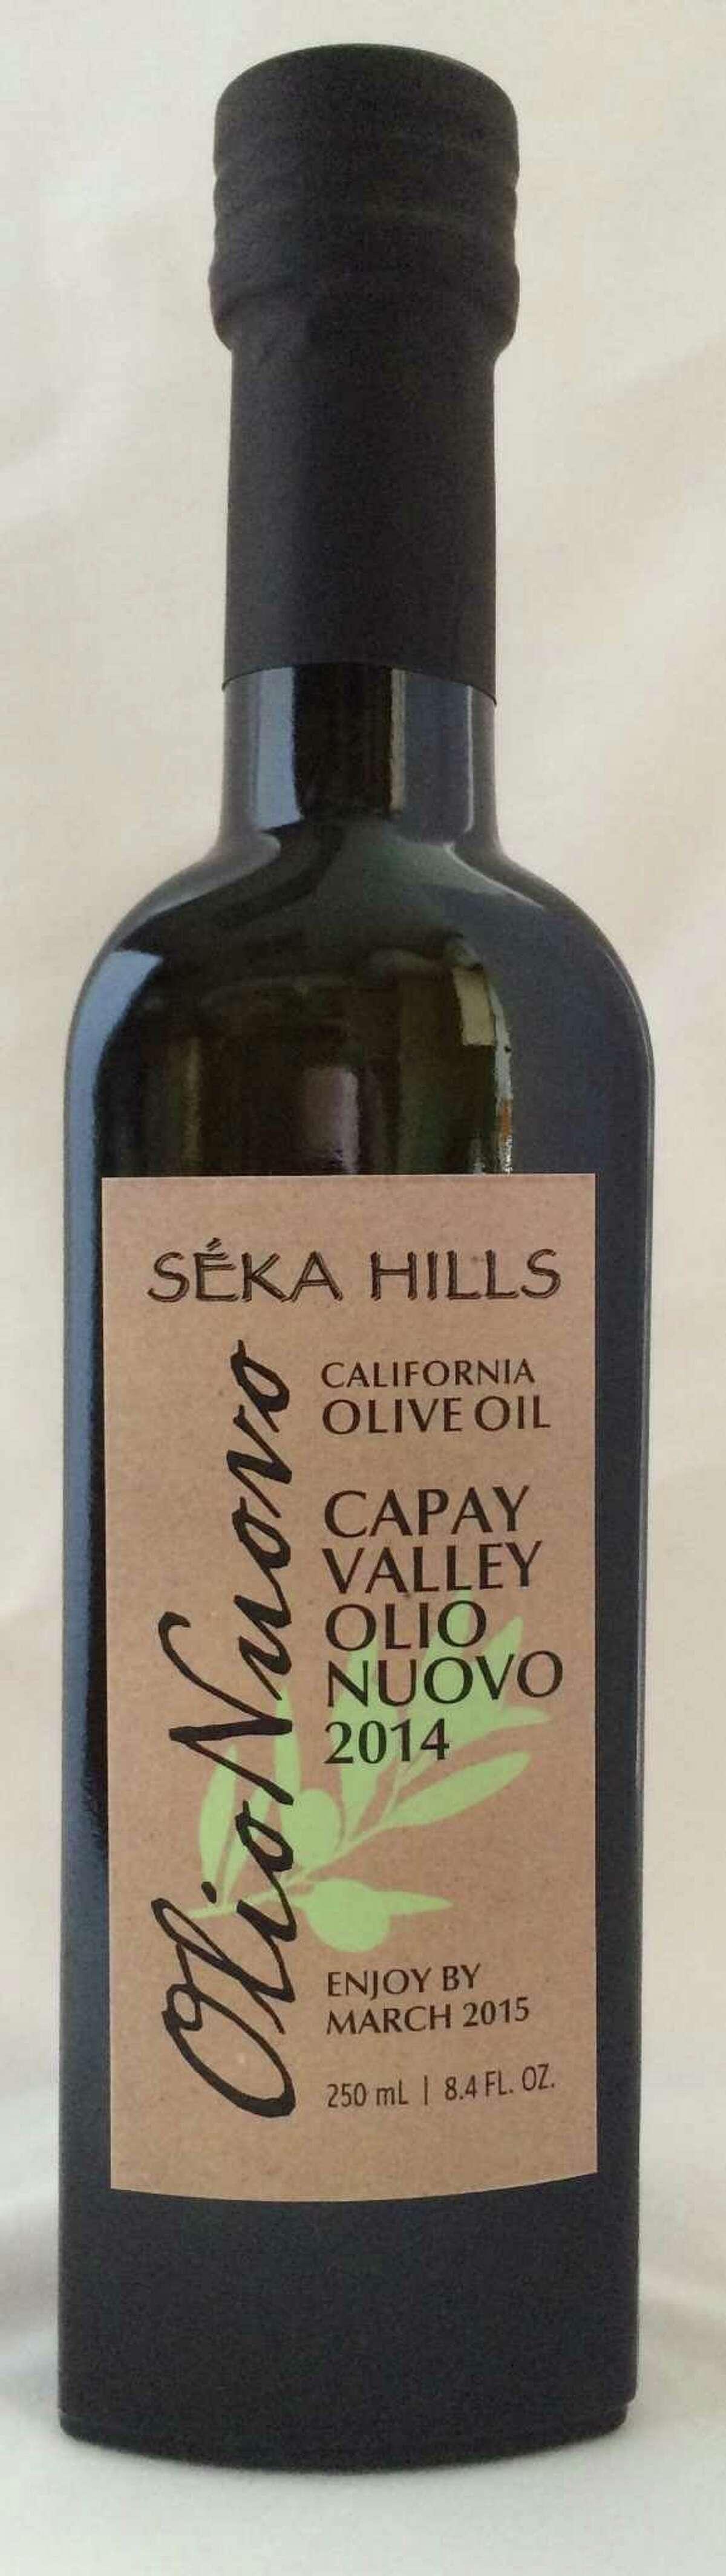 Seka Hills Capay Valley olio nuovo